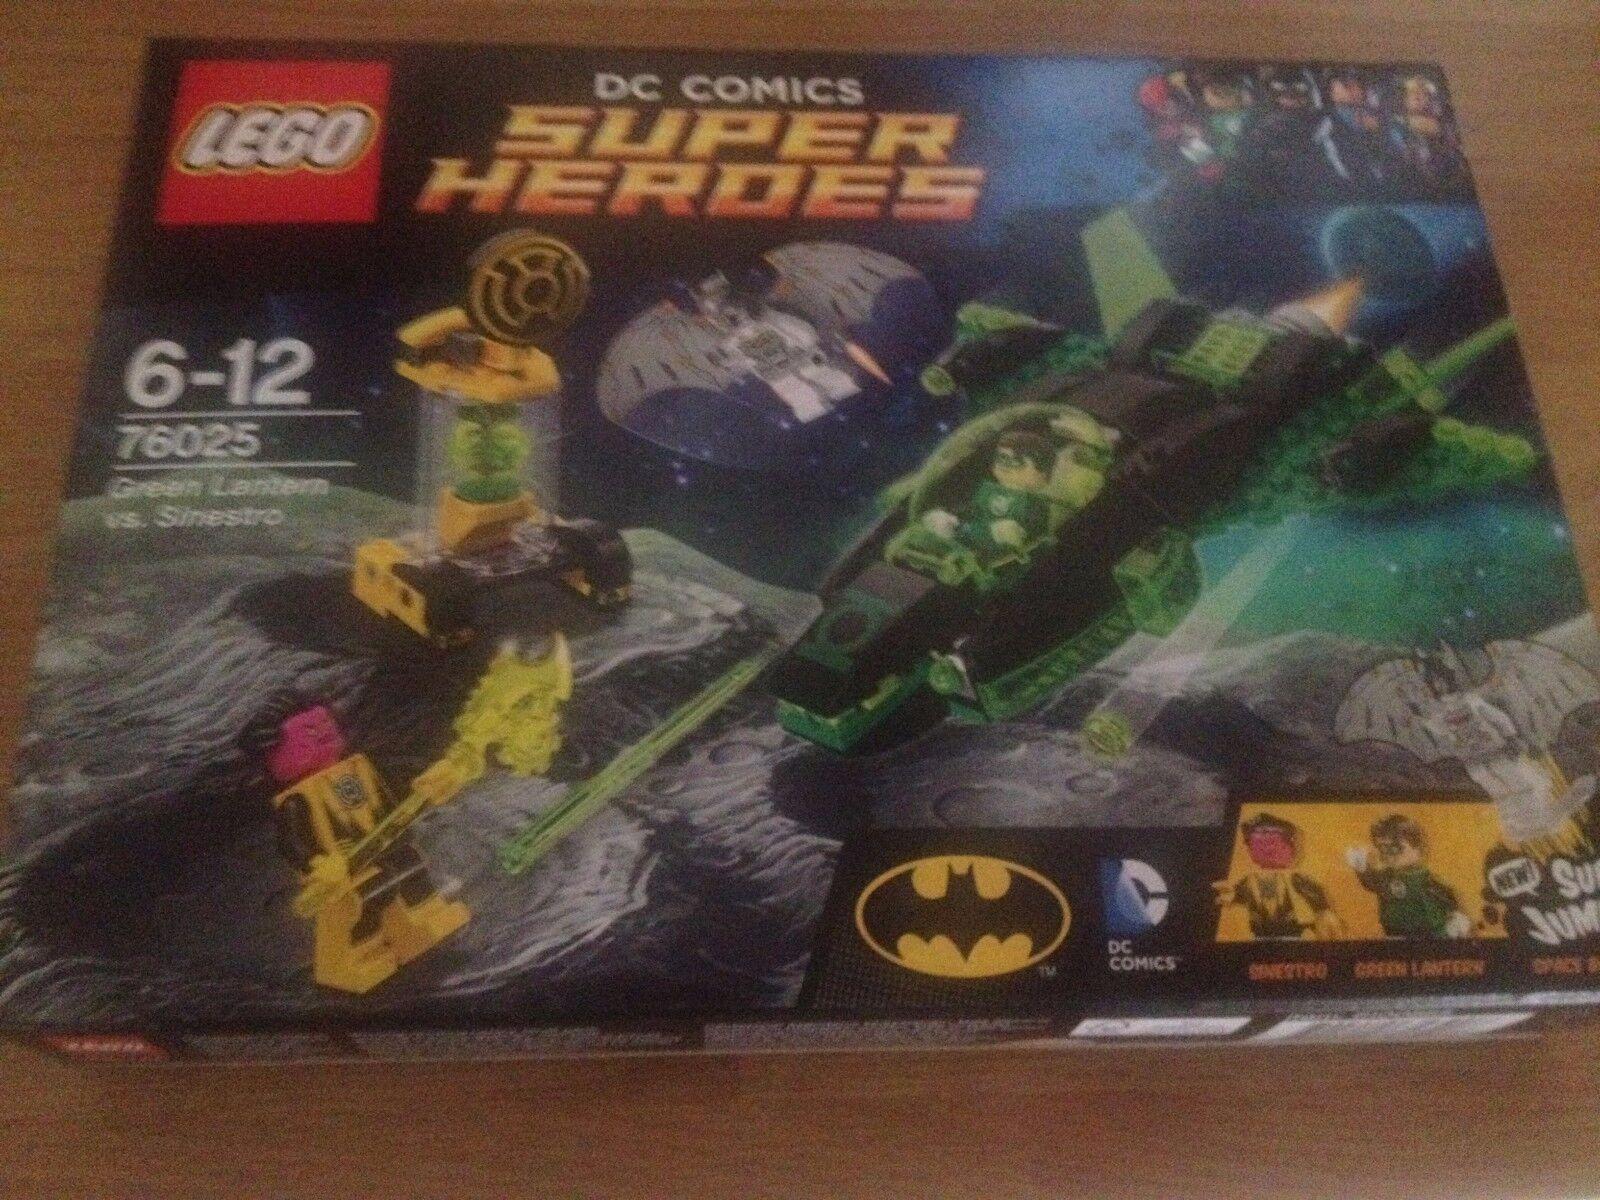 Lego DC SUPER HEROES  76025 Green Lantern vs. Sinestro Sinestro Sinestro  Brand new,factory sealed 45a661